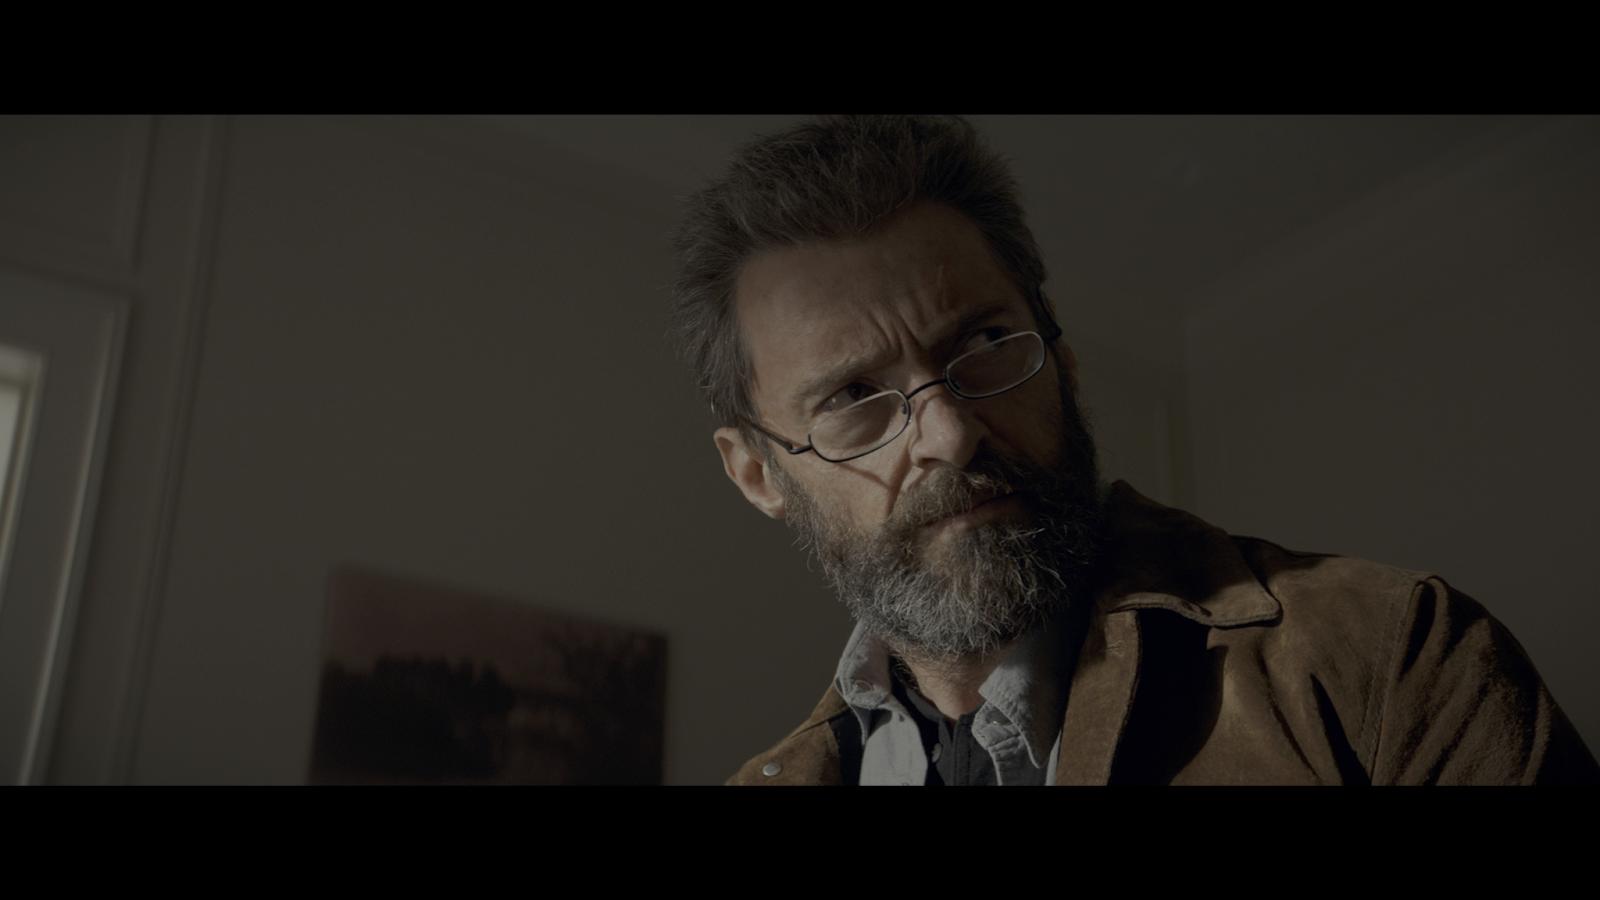 Logan: Wolverine (2017) 4K UHD Blu-Ray Completo captura 1